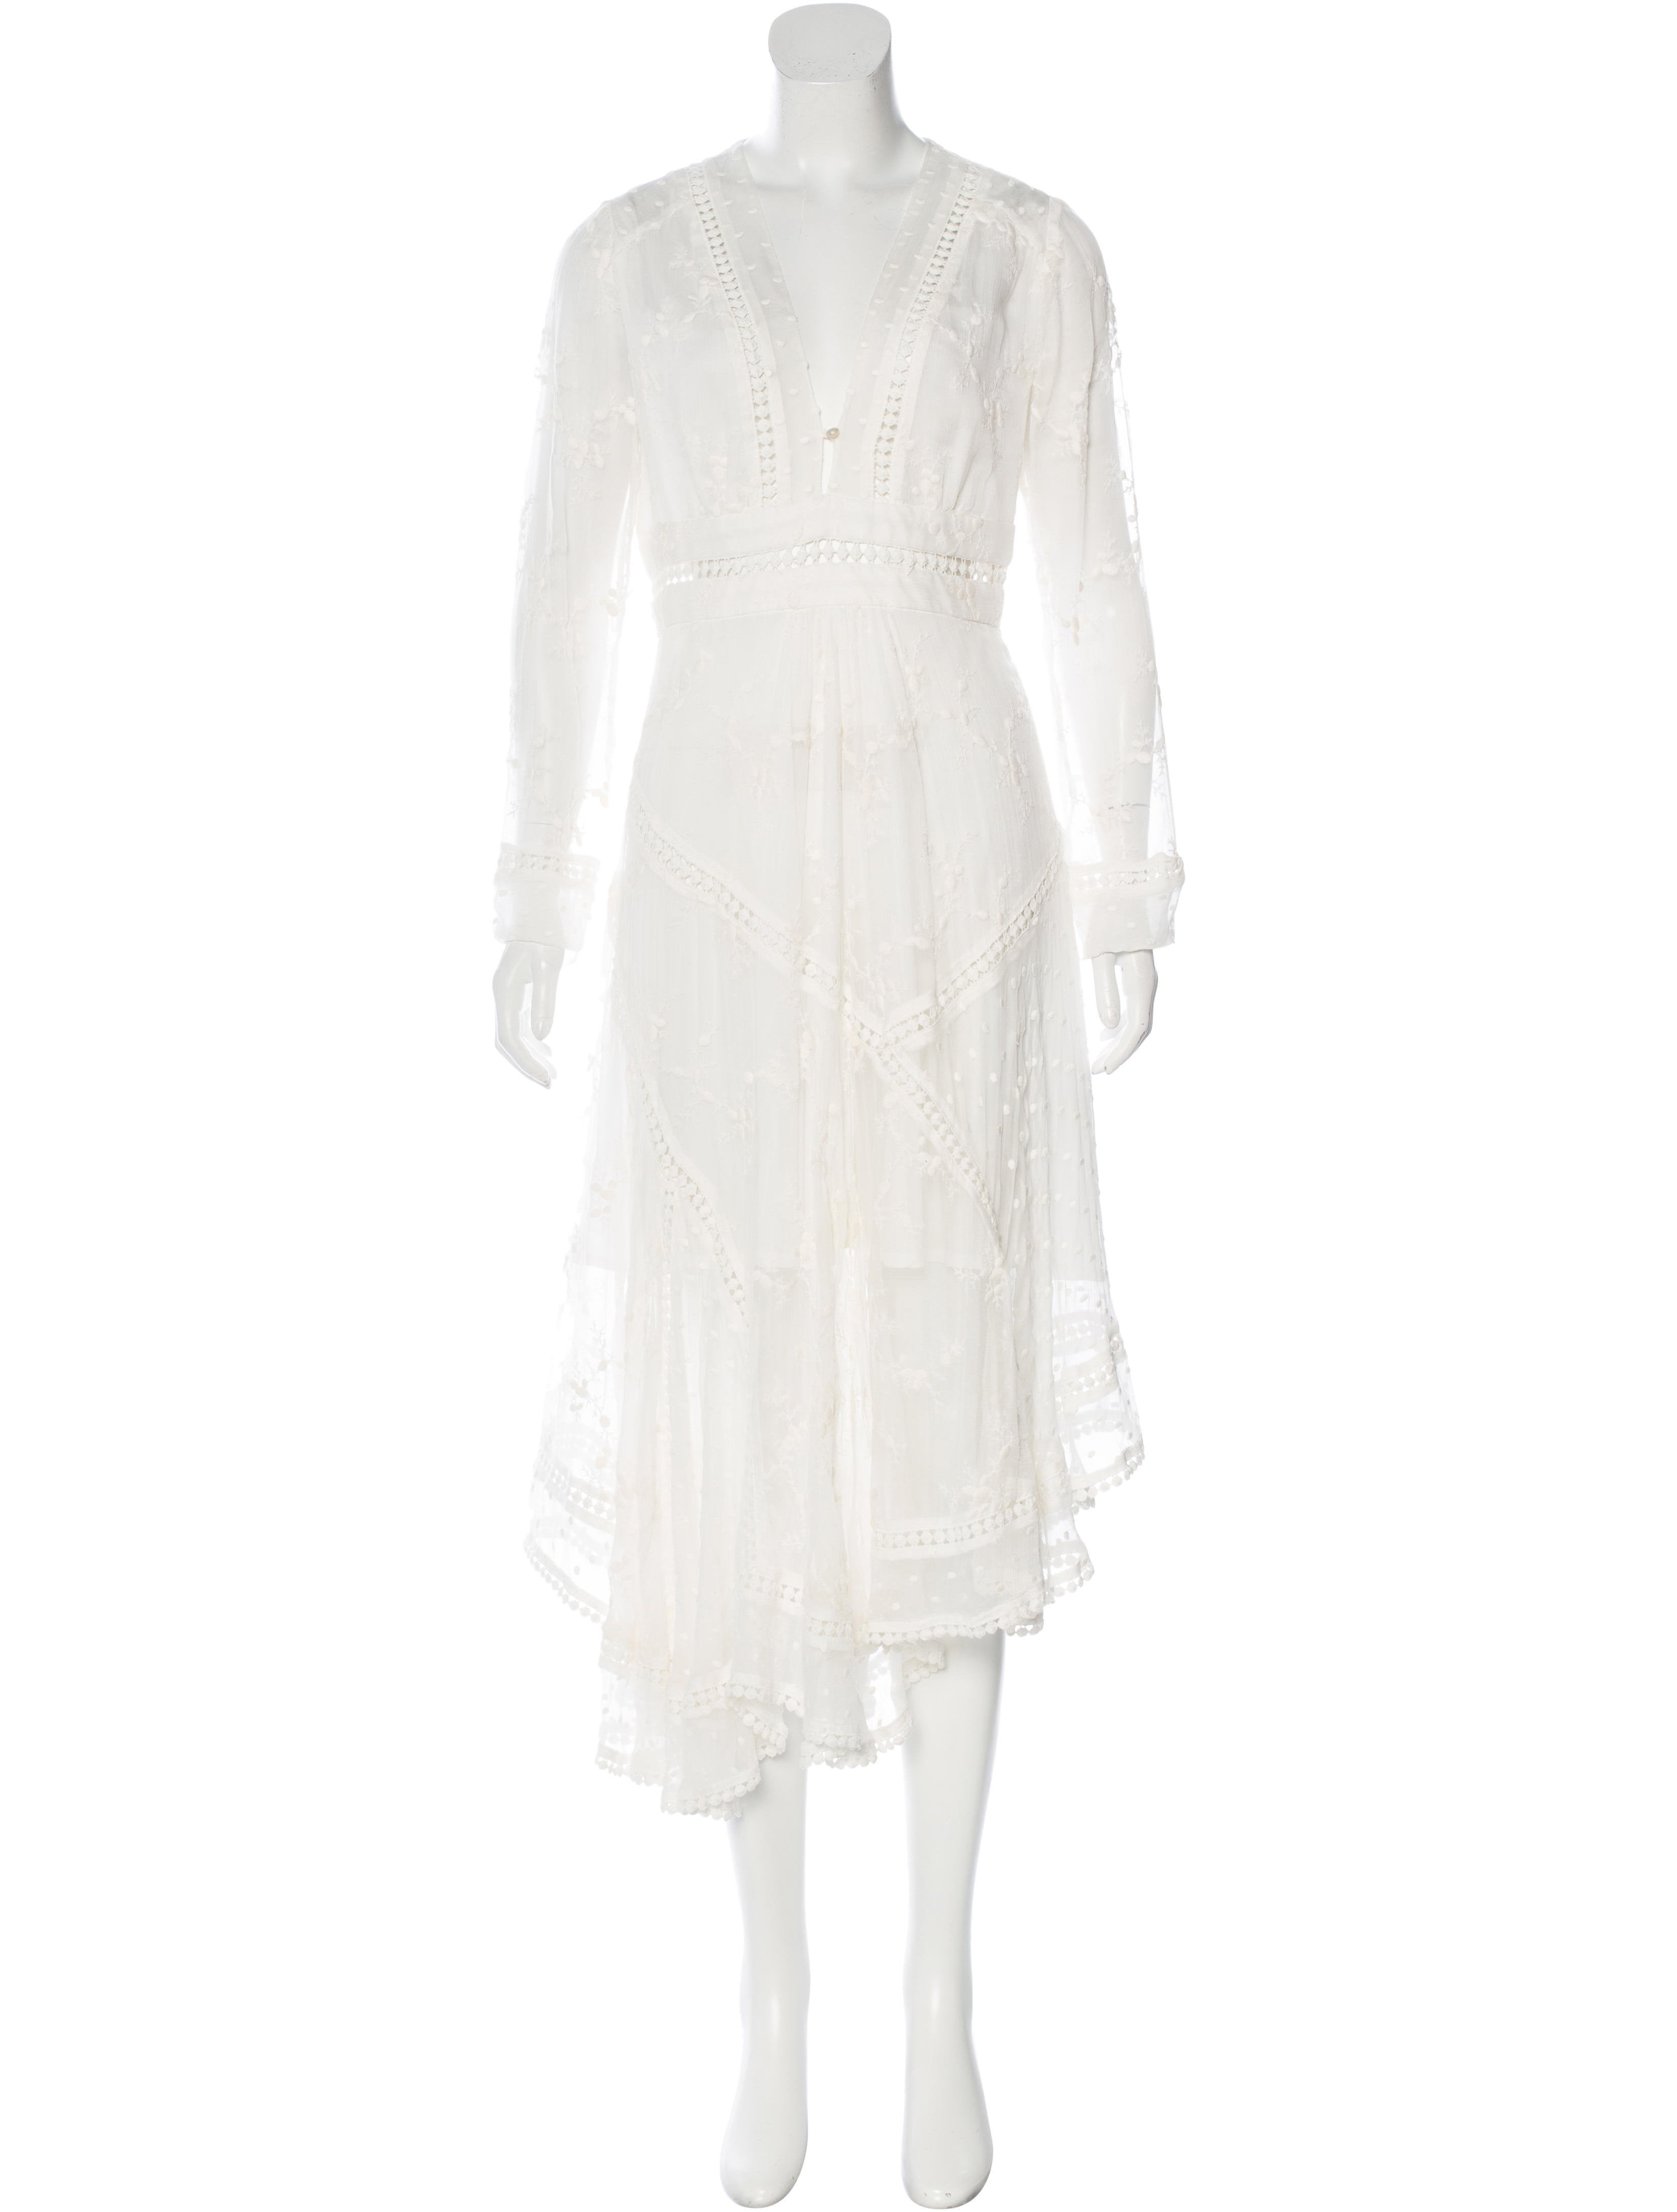 Zimmermann silk embroidered dress clothing wzi